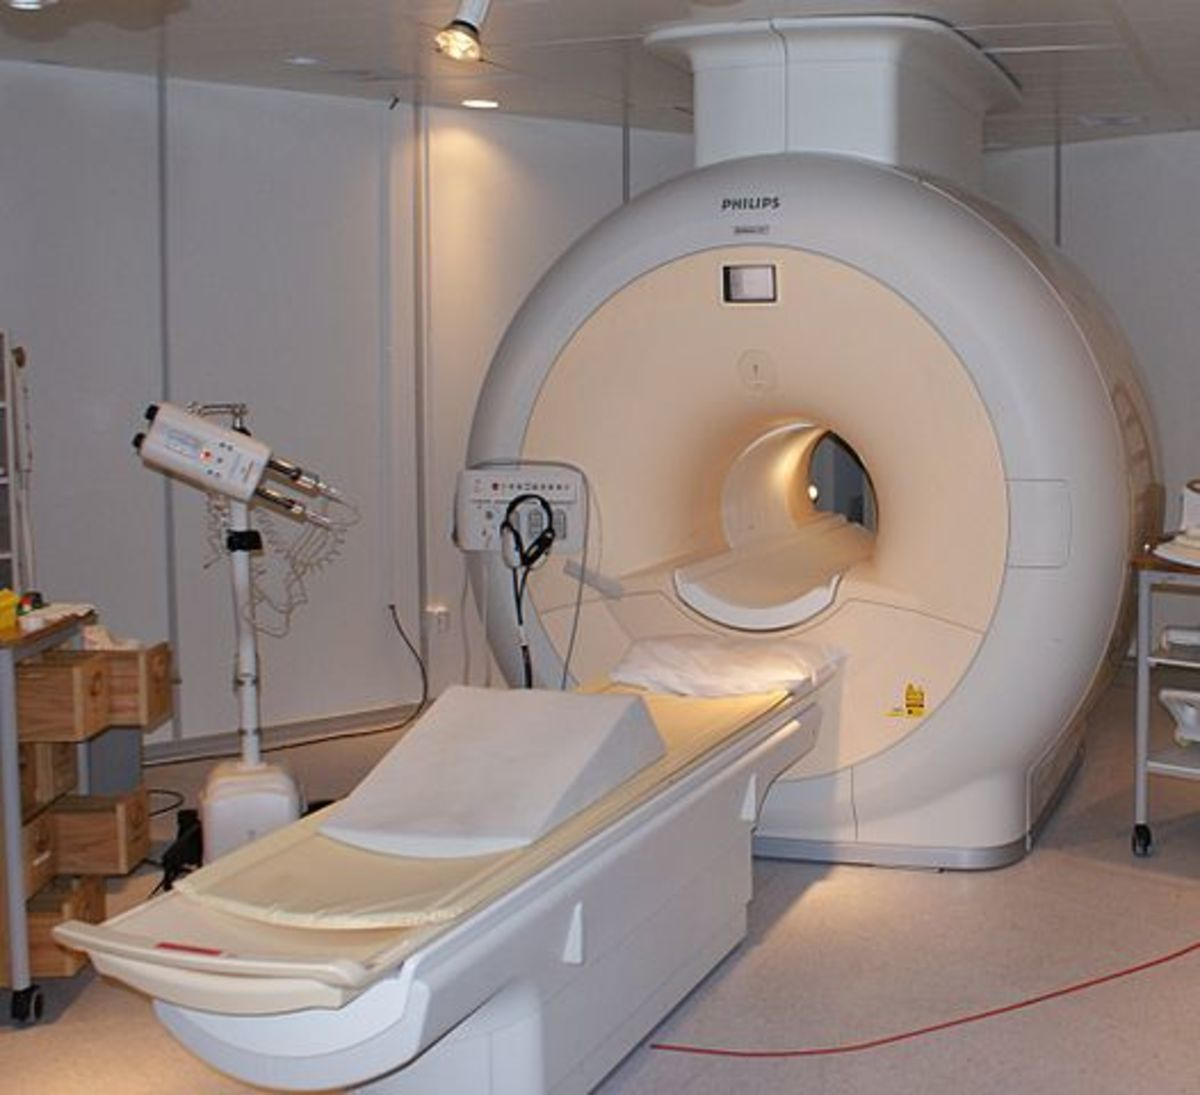 A Philips MRI